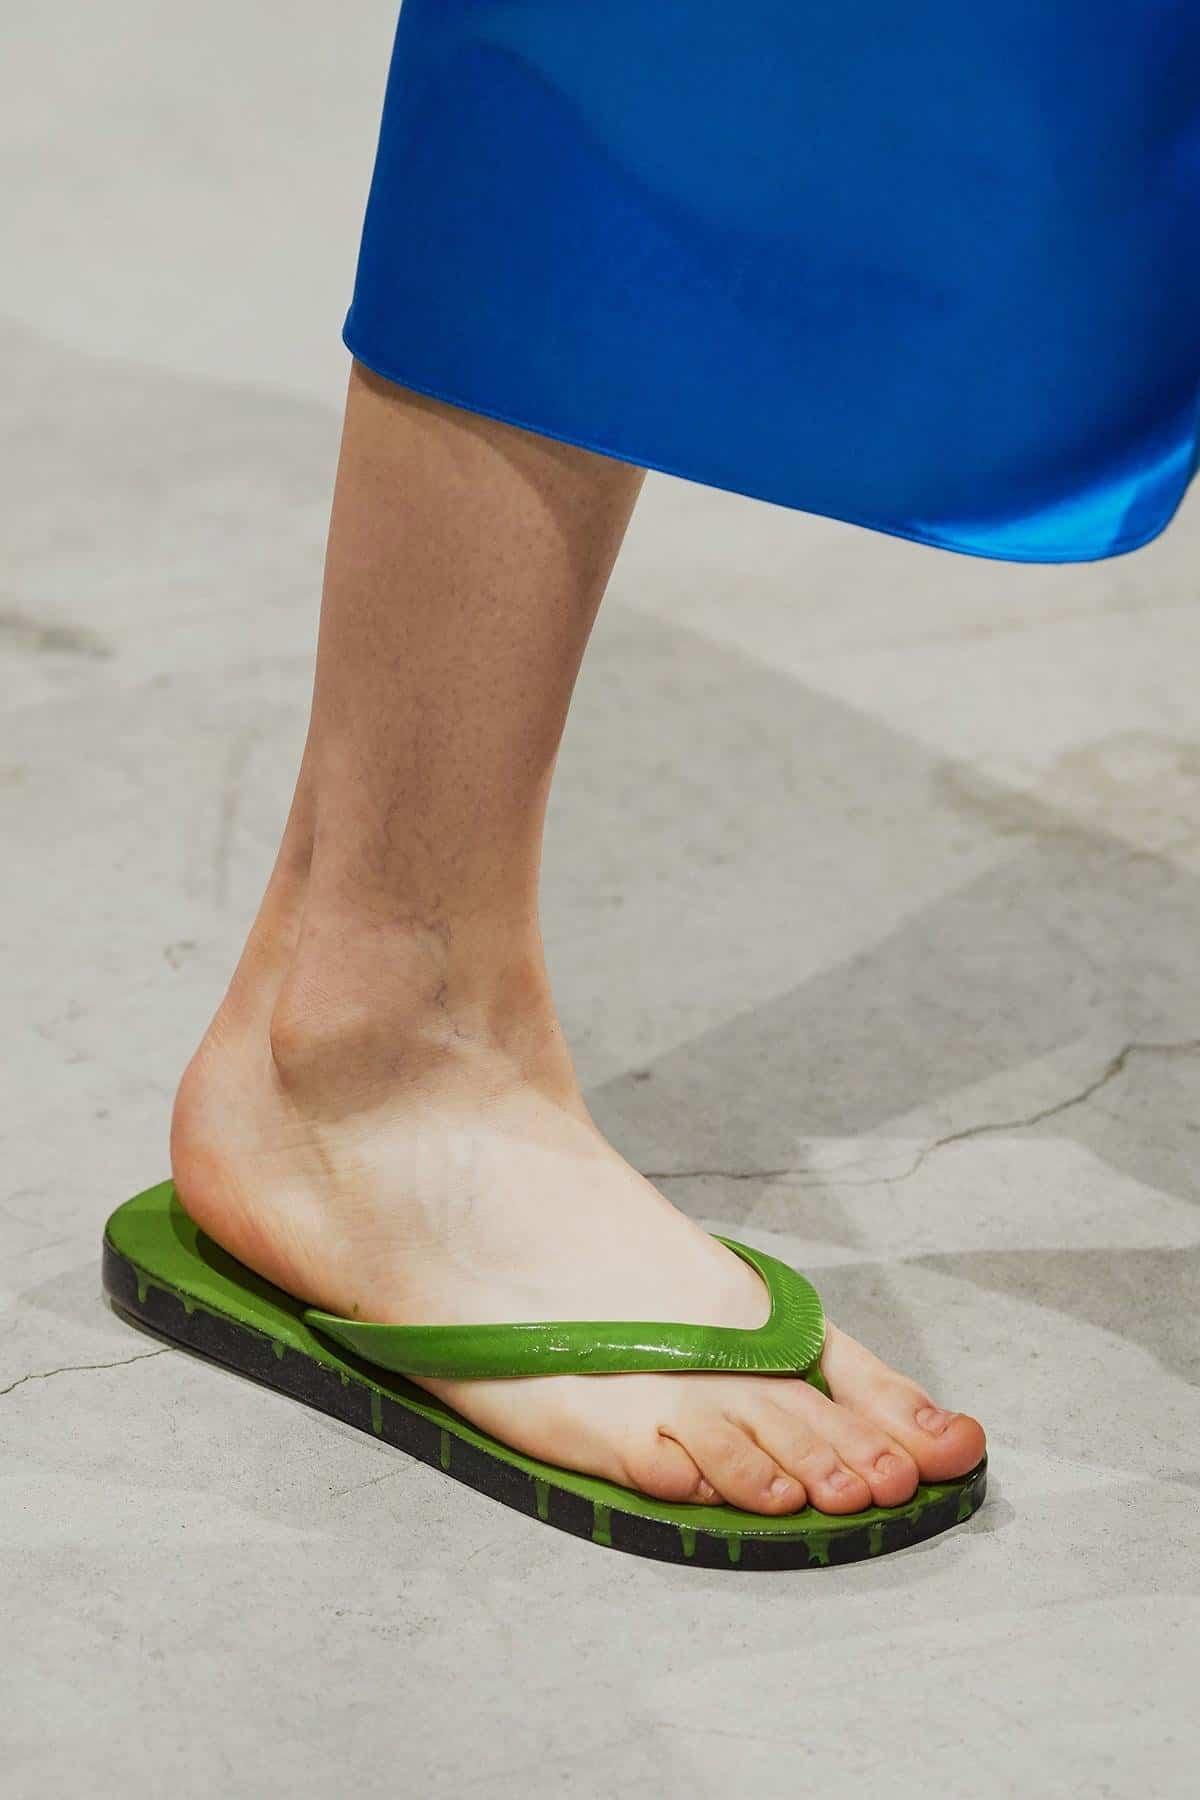 وحذاء Marni.